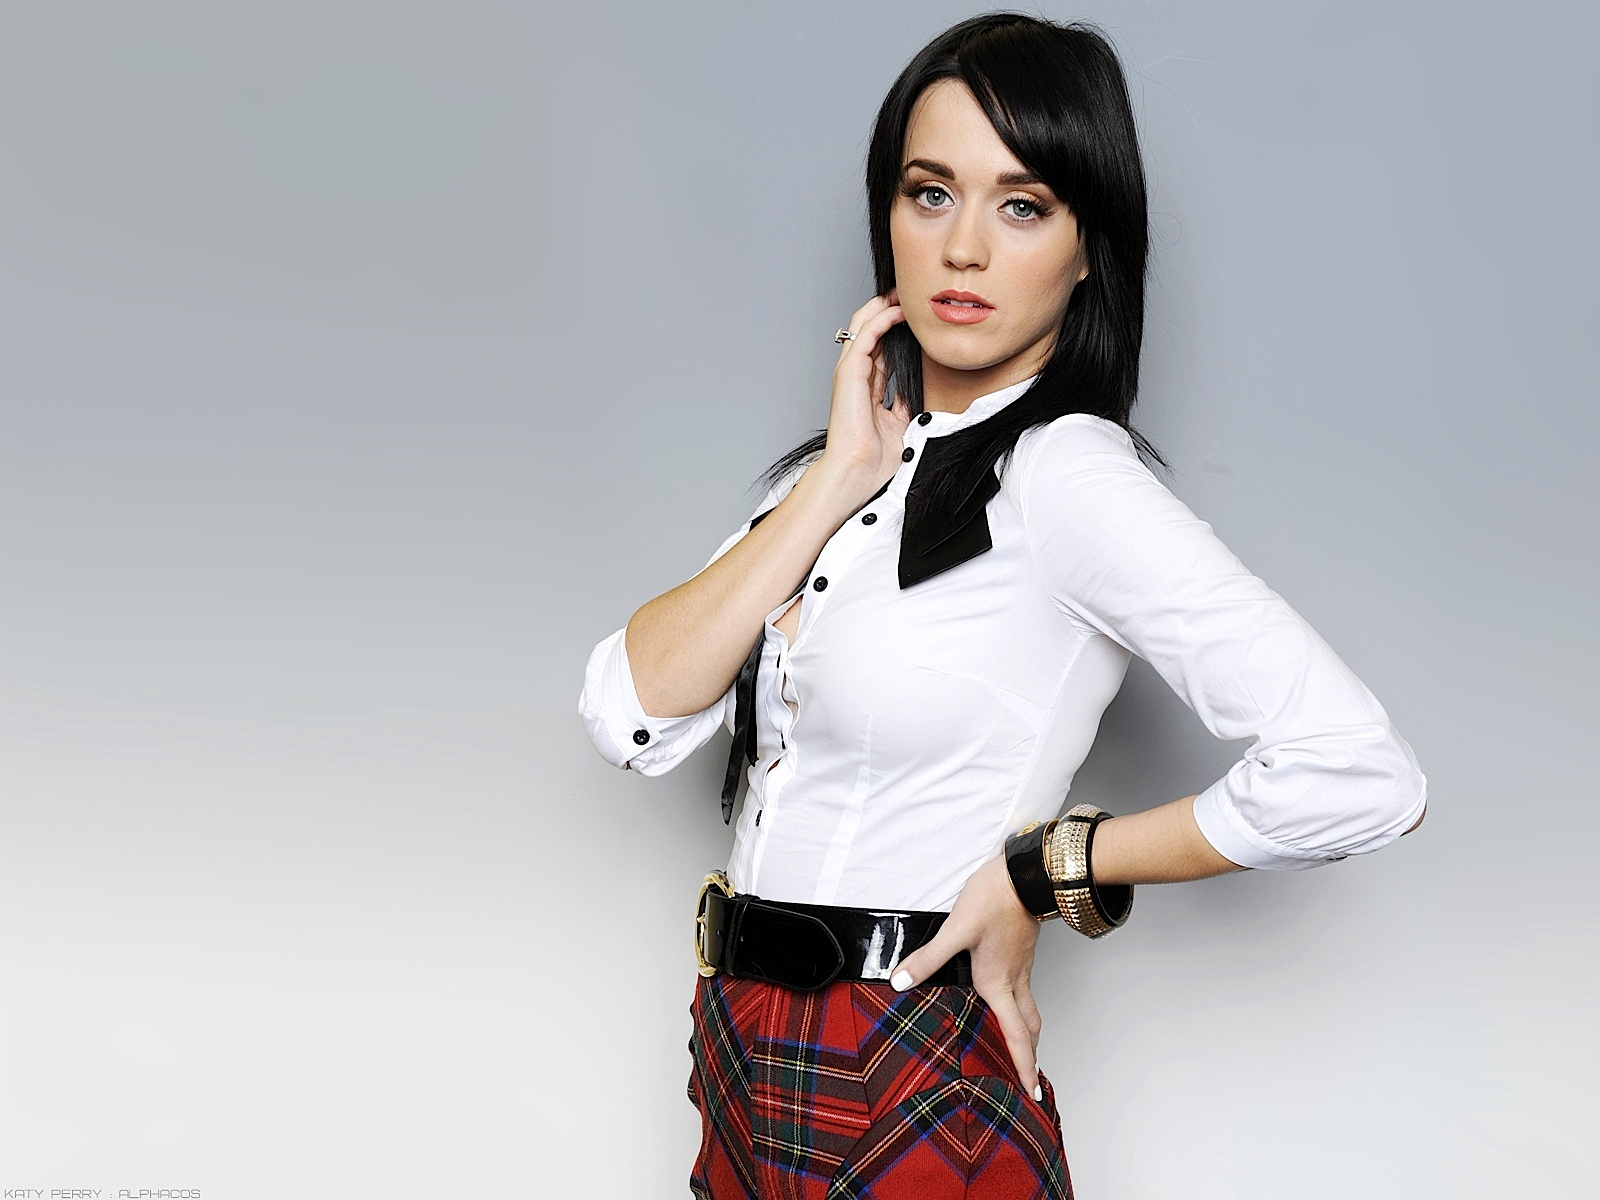 Katy Perry: Black Hack: Katy Perry Beautiful HD Wallpapers